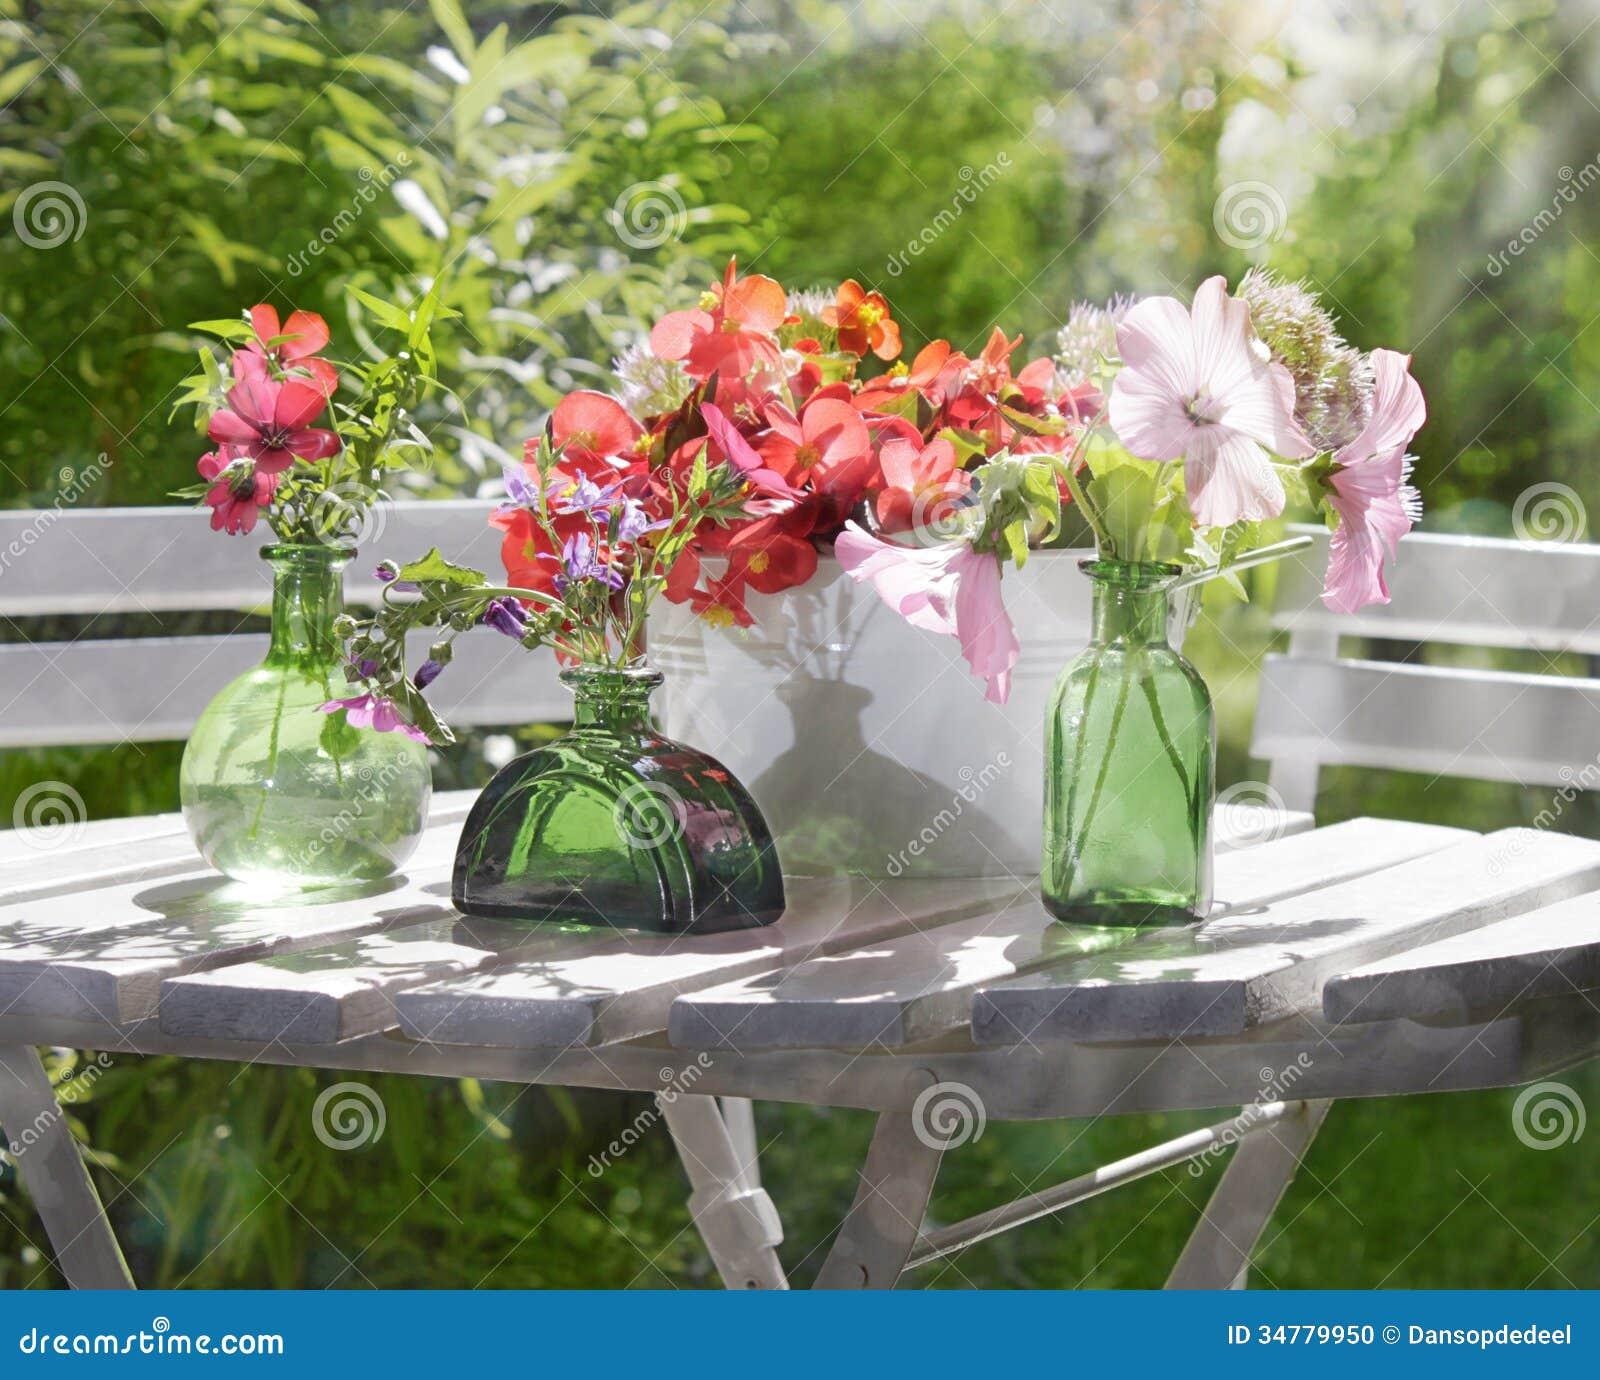 Sunny Garden Flower Arrangement Stock Photo Image 34779950